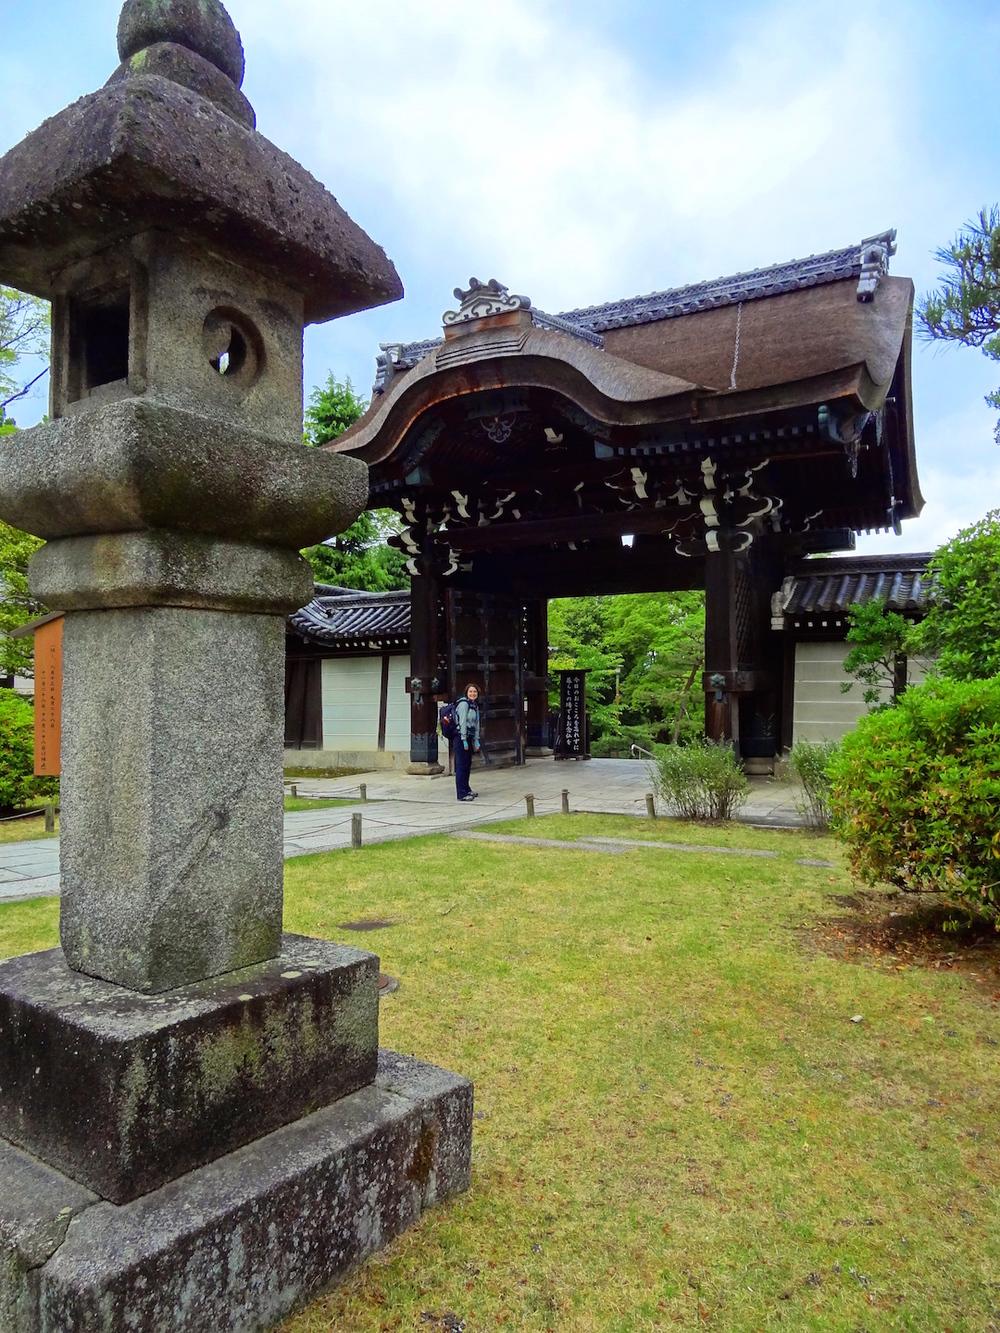 P2 Japan Wk1 stone monument small.jpeg